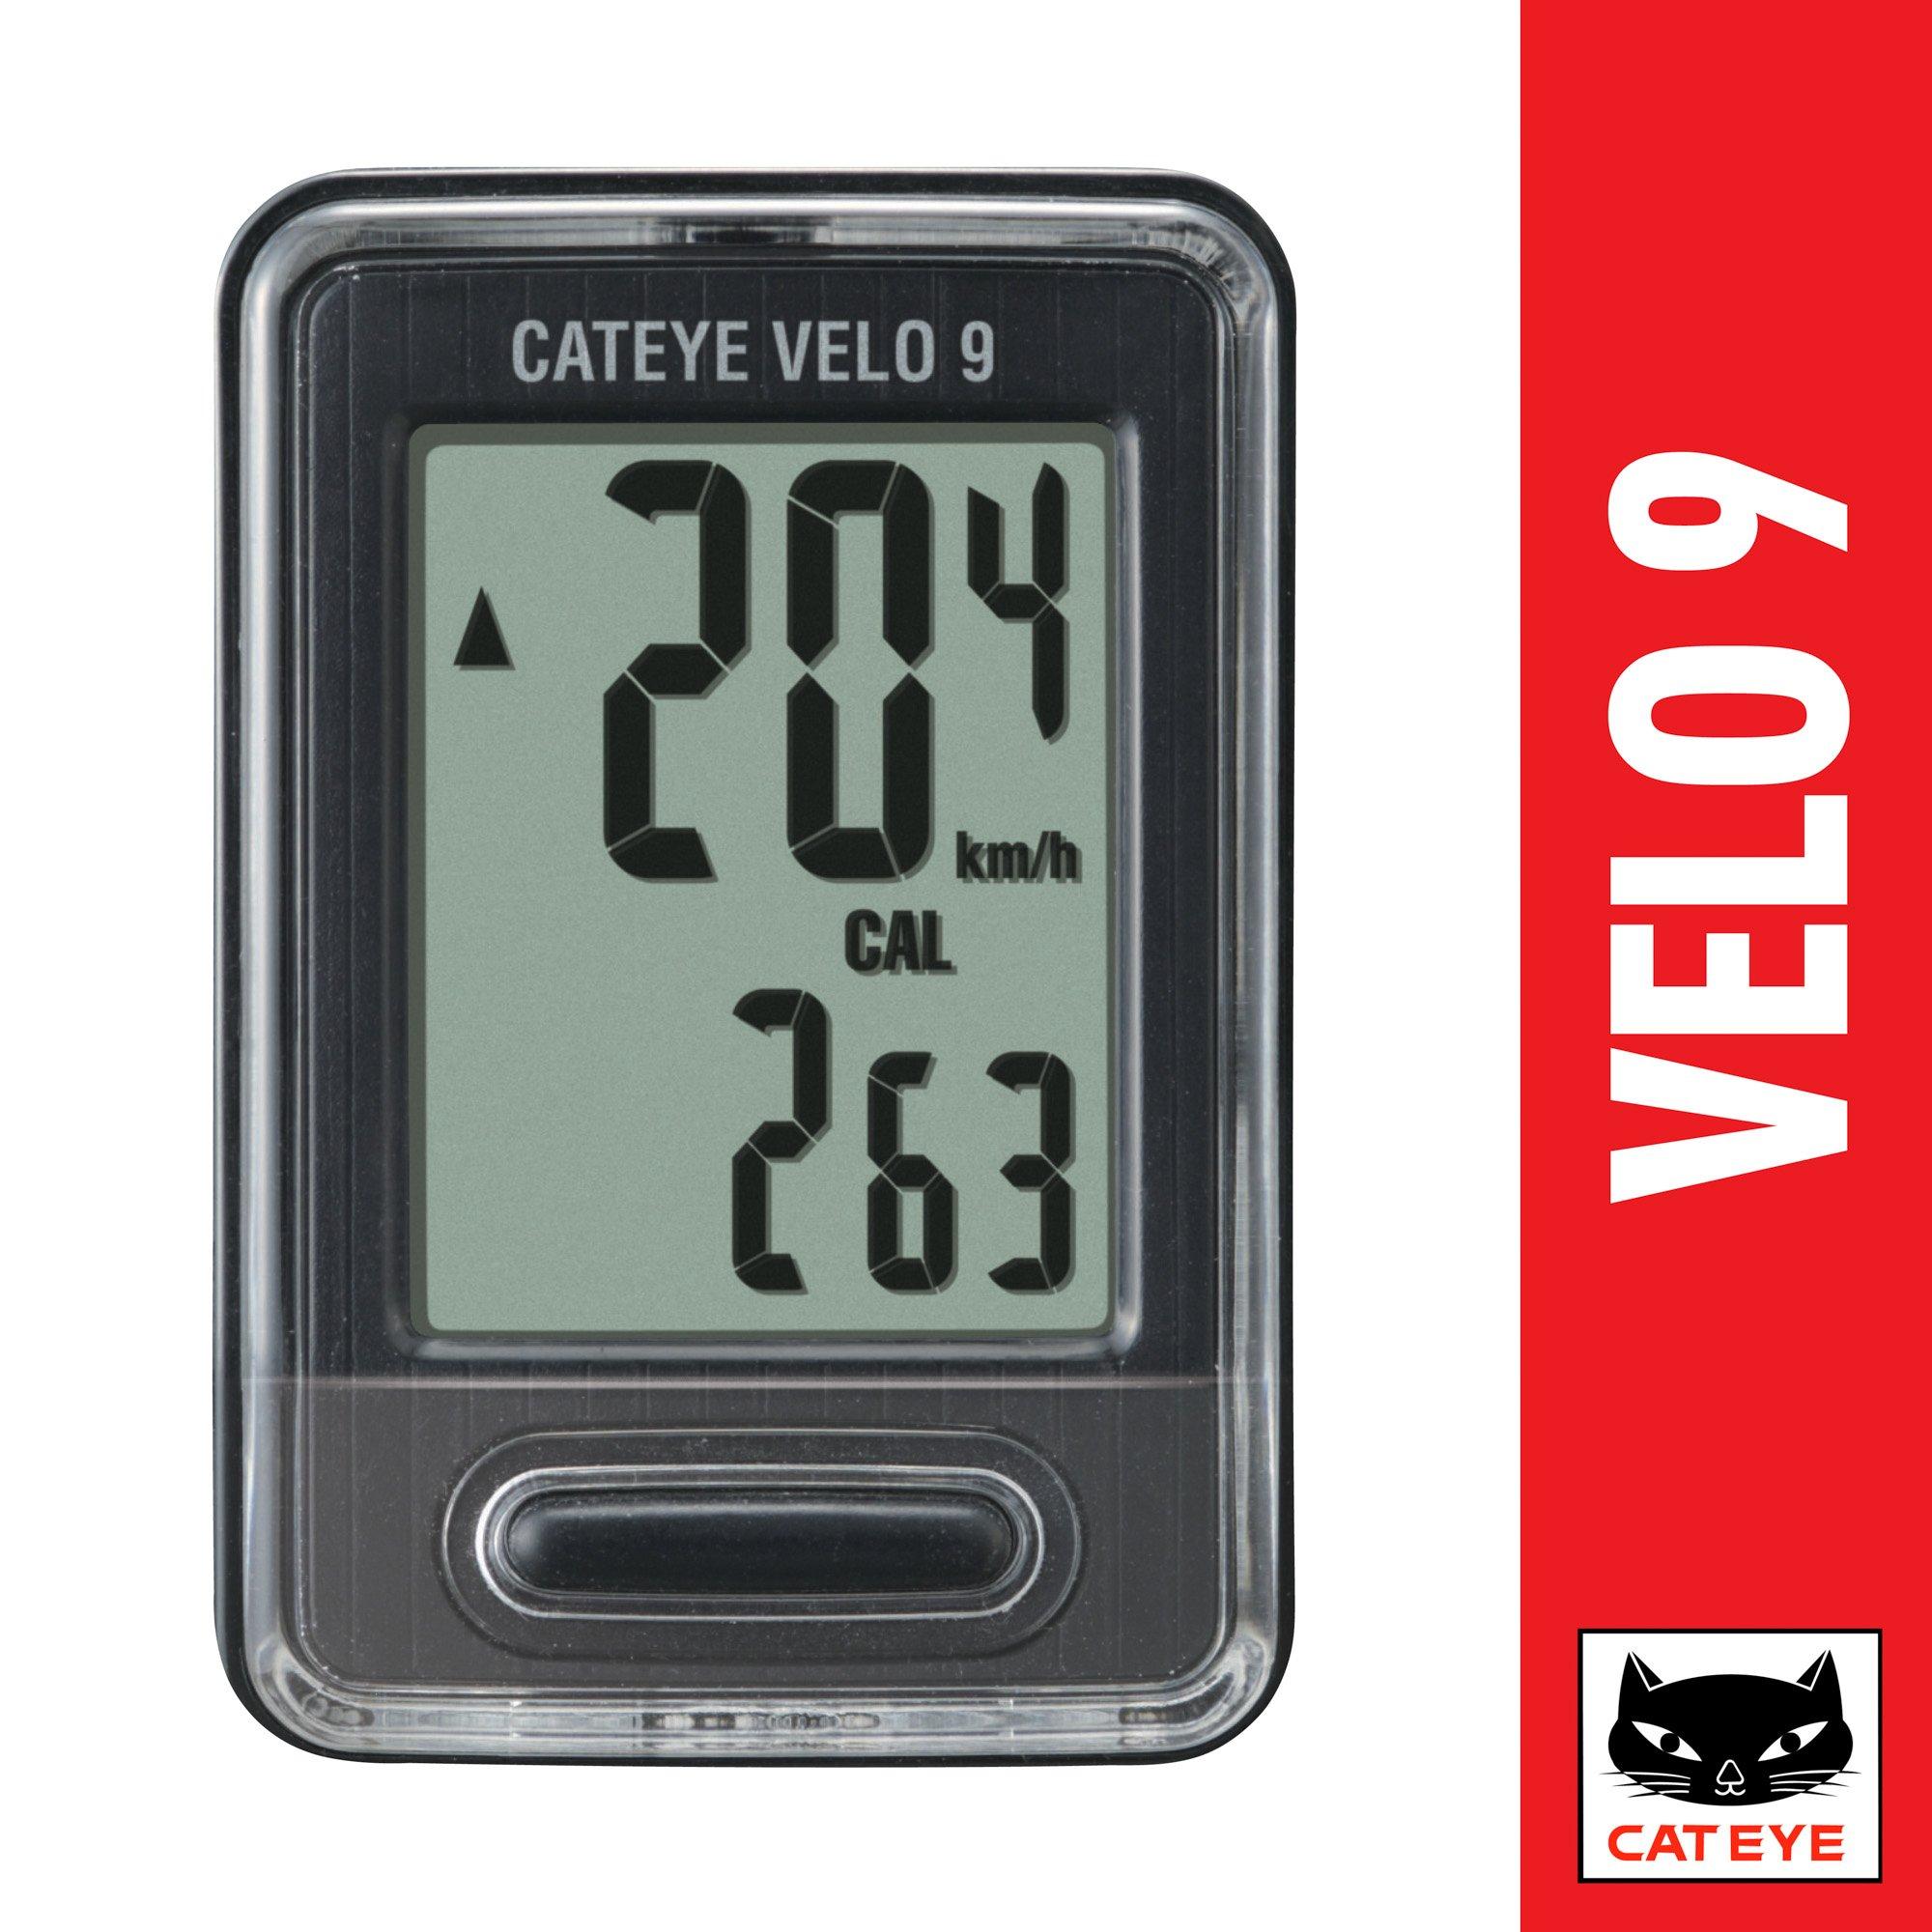 CAT EYE - Velo 9 Wired Bike Computer, Black